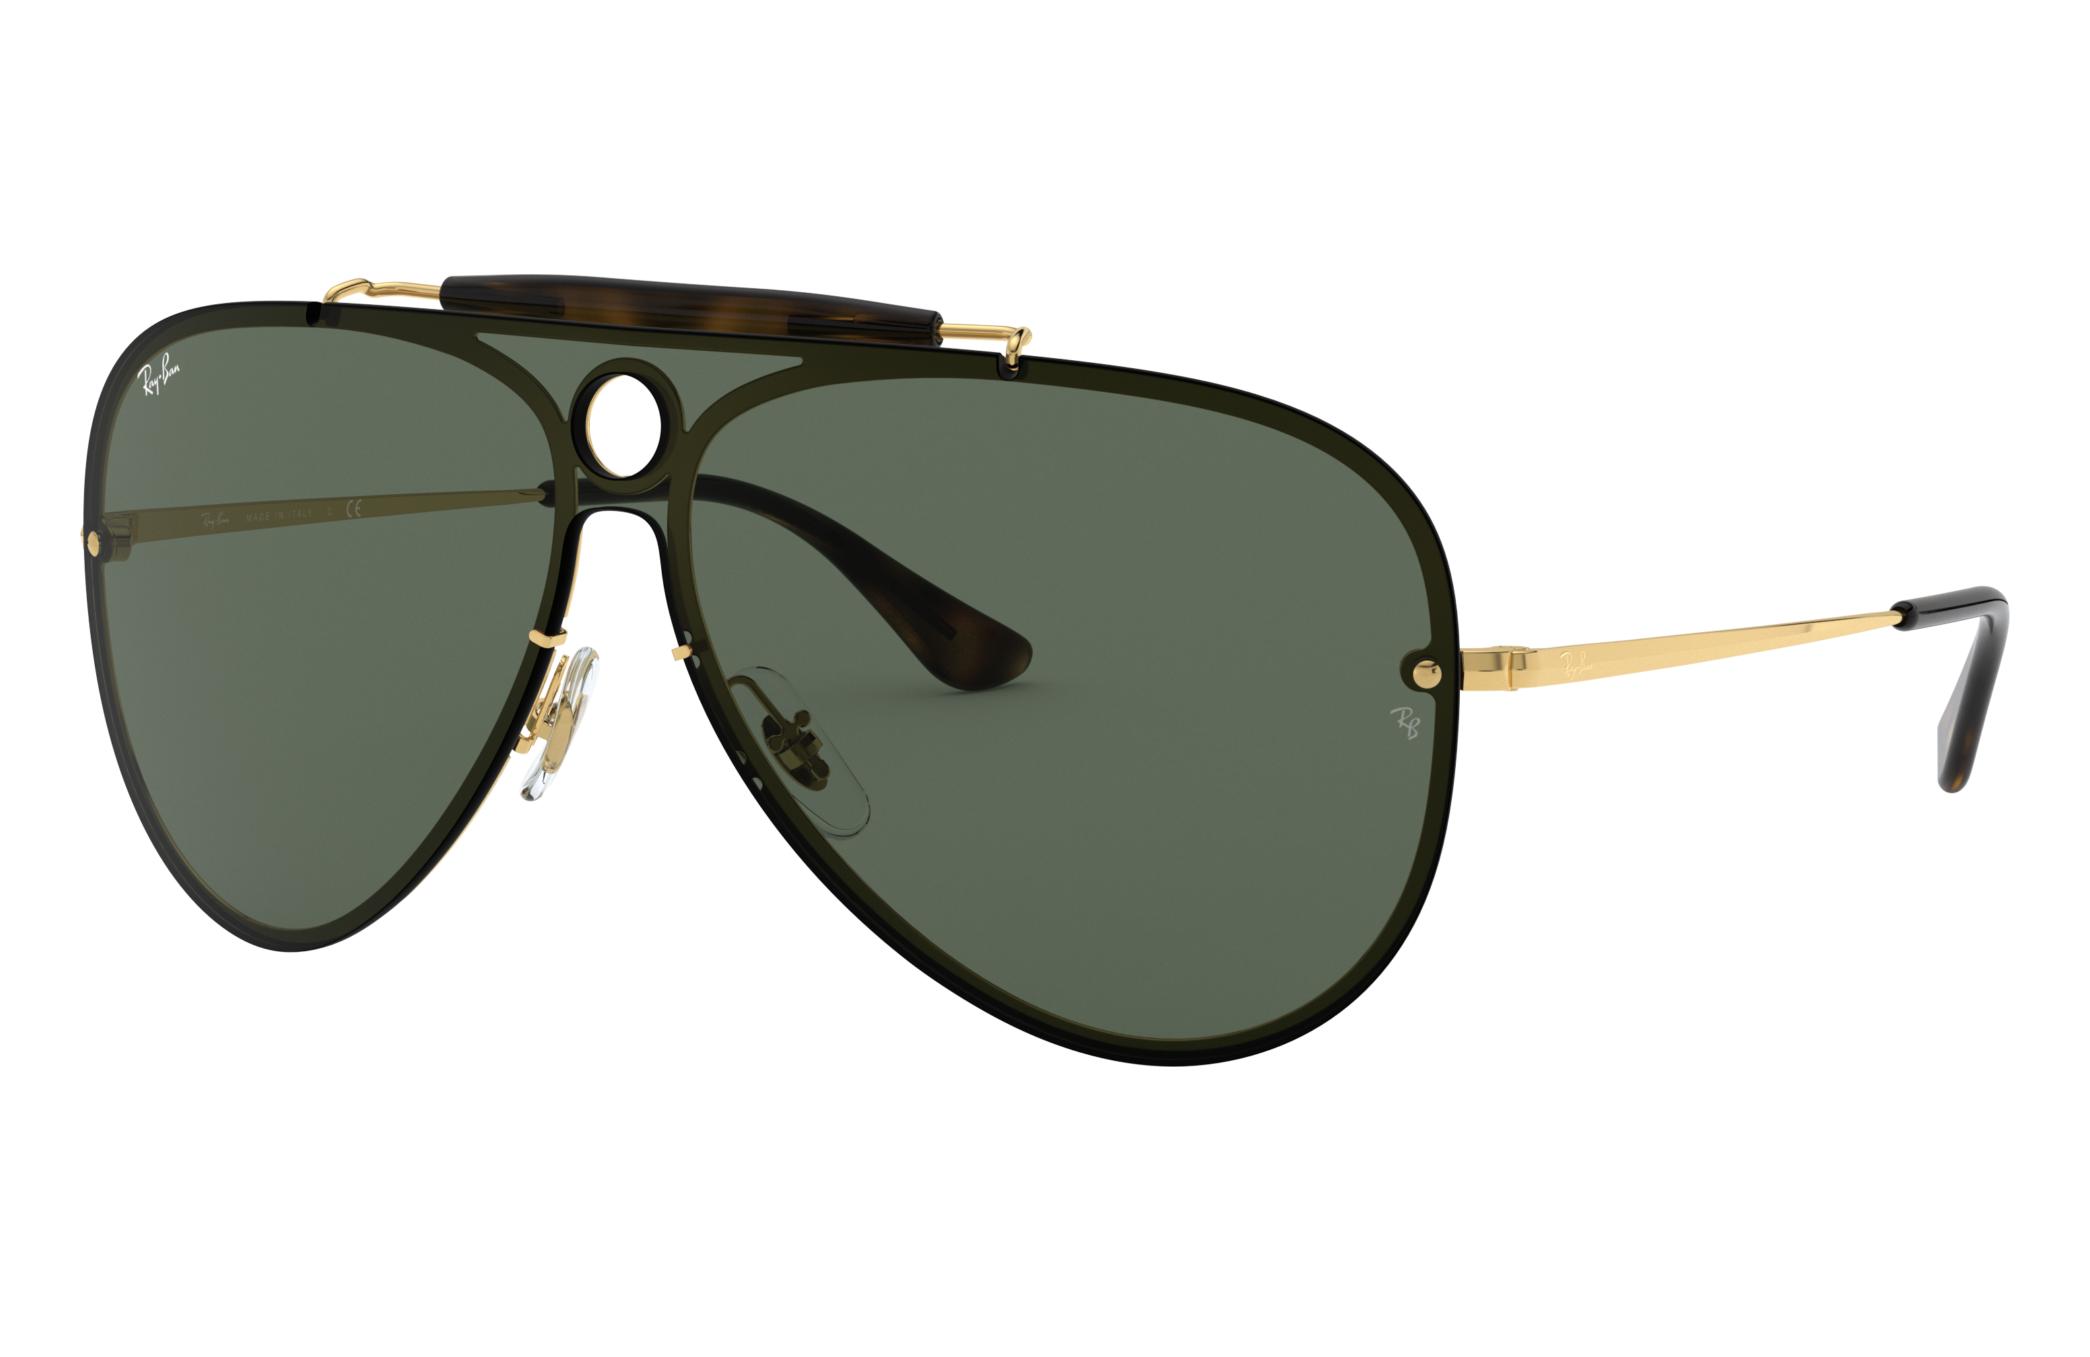 Ray-Ban Blaze Shooter Gold, Green Lenses - RB3581N